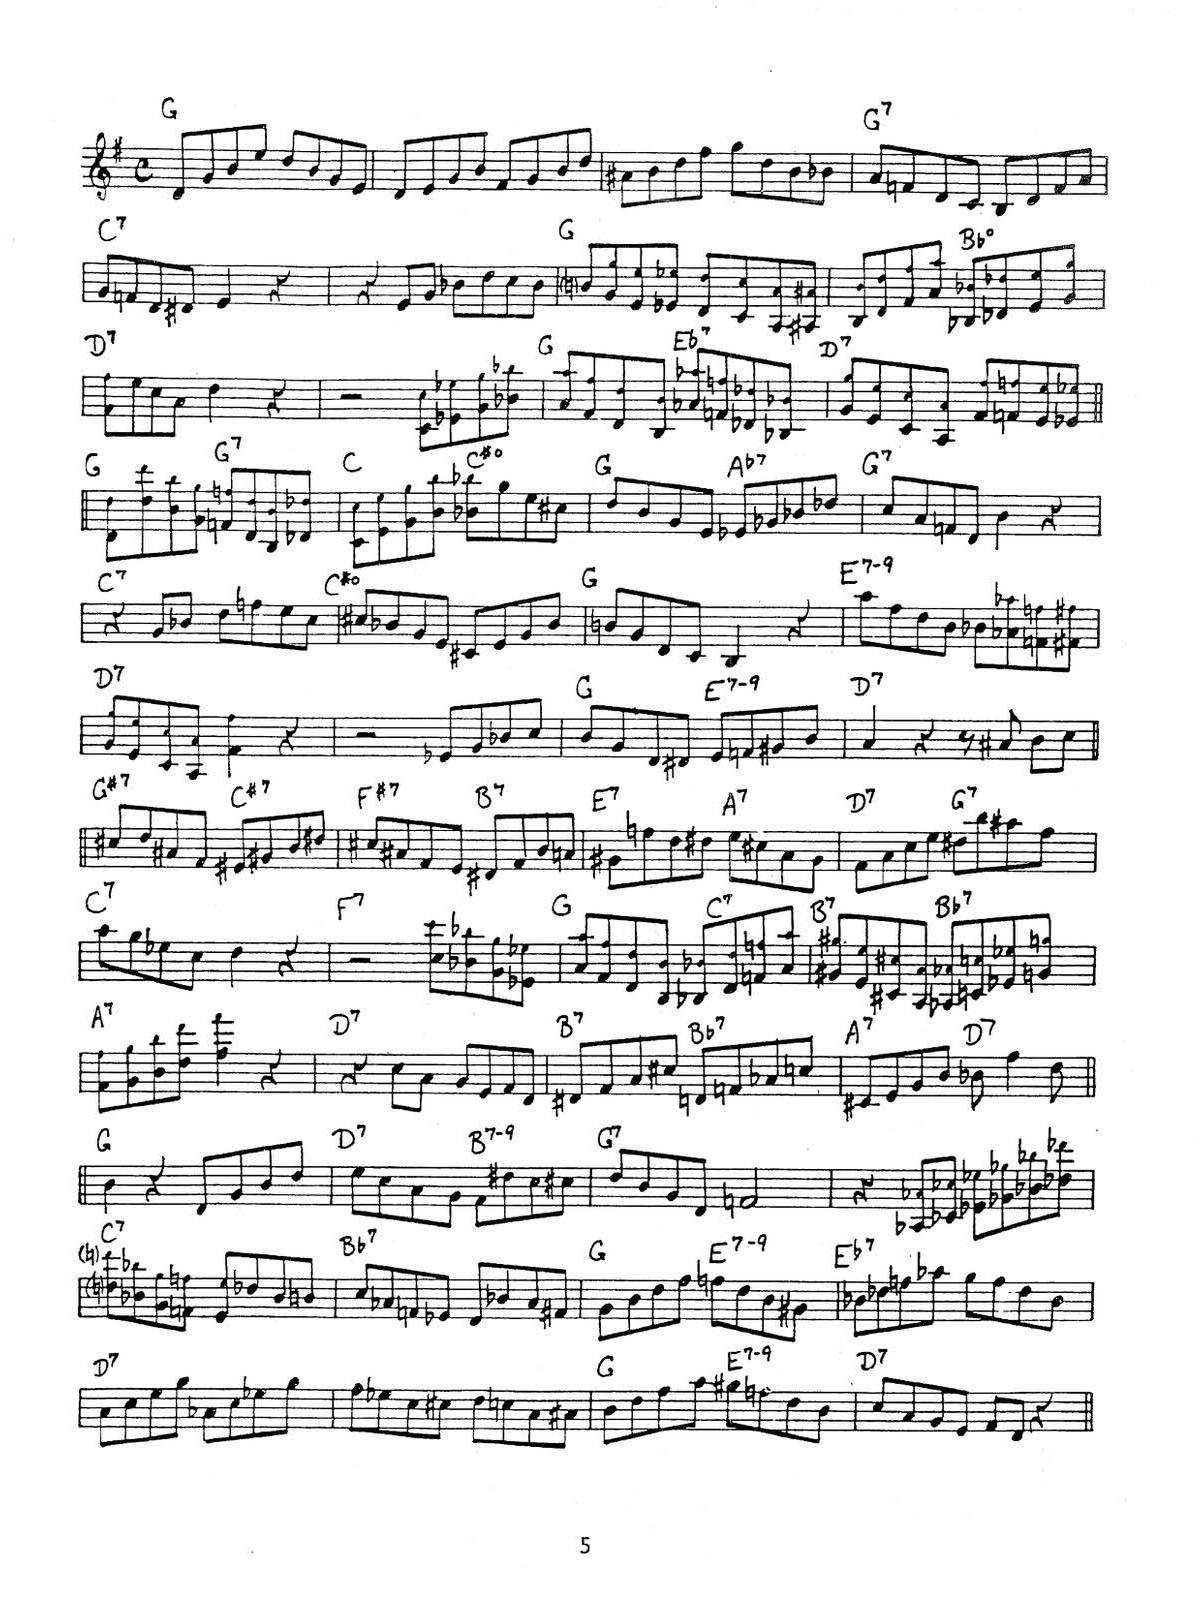 Berger, David Contemporary Jazz Studies V.1_Page_07